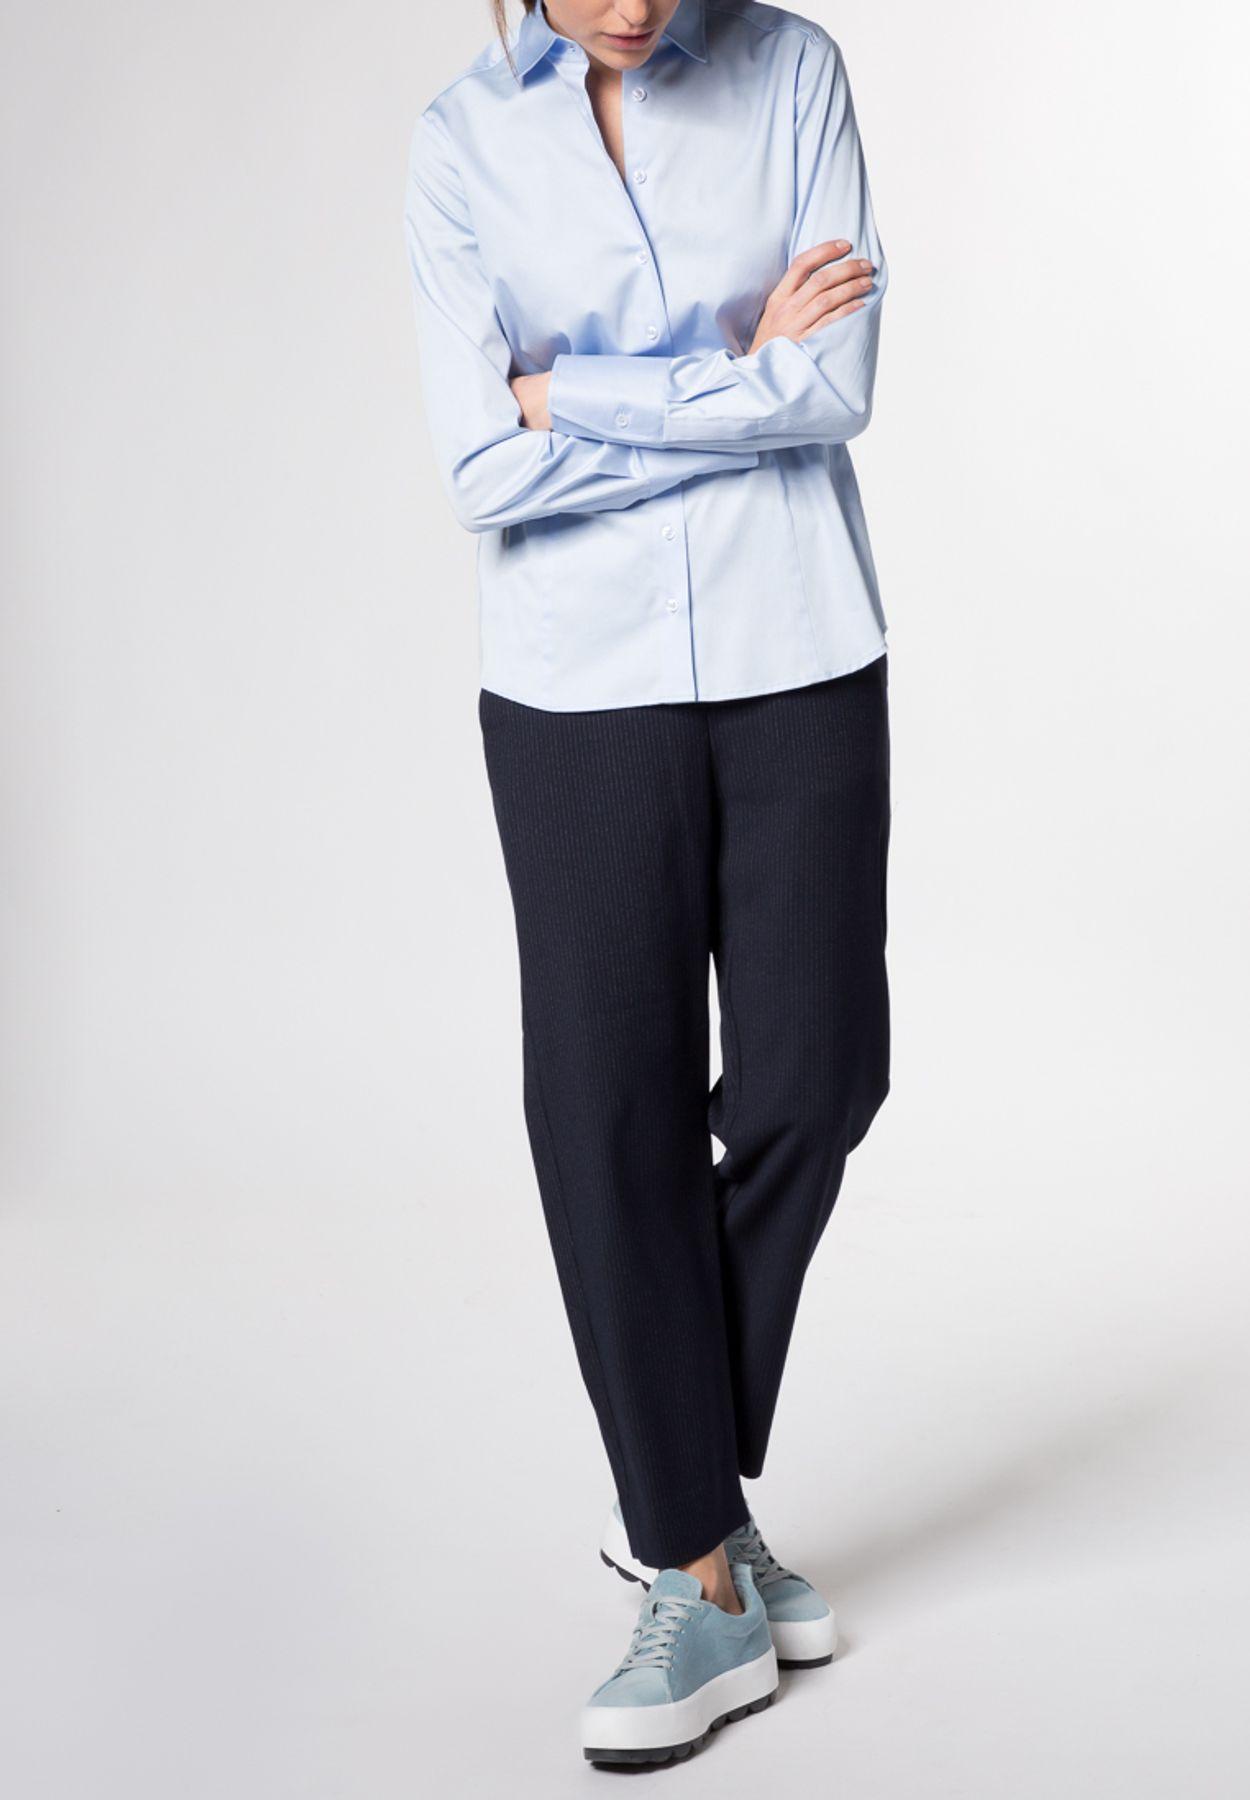 Eterna - Comfort Fit - Damen Langarm Bluse Modern Classic Stretch in versch. Farben (5352 D708) – Bild 7